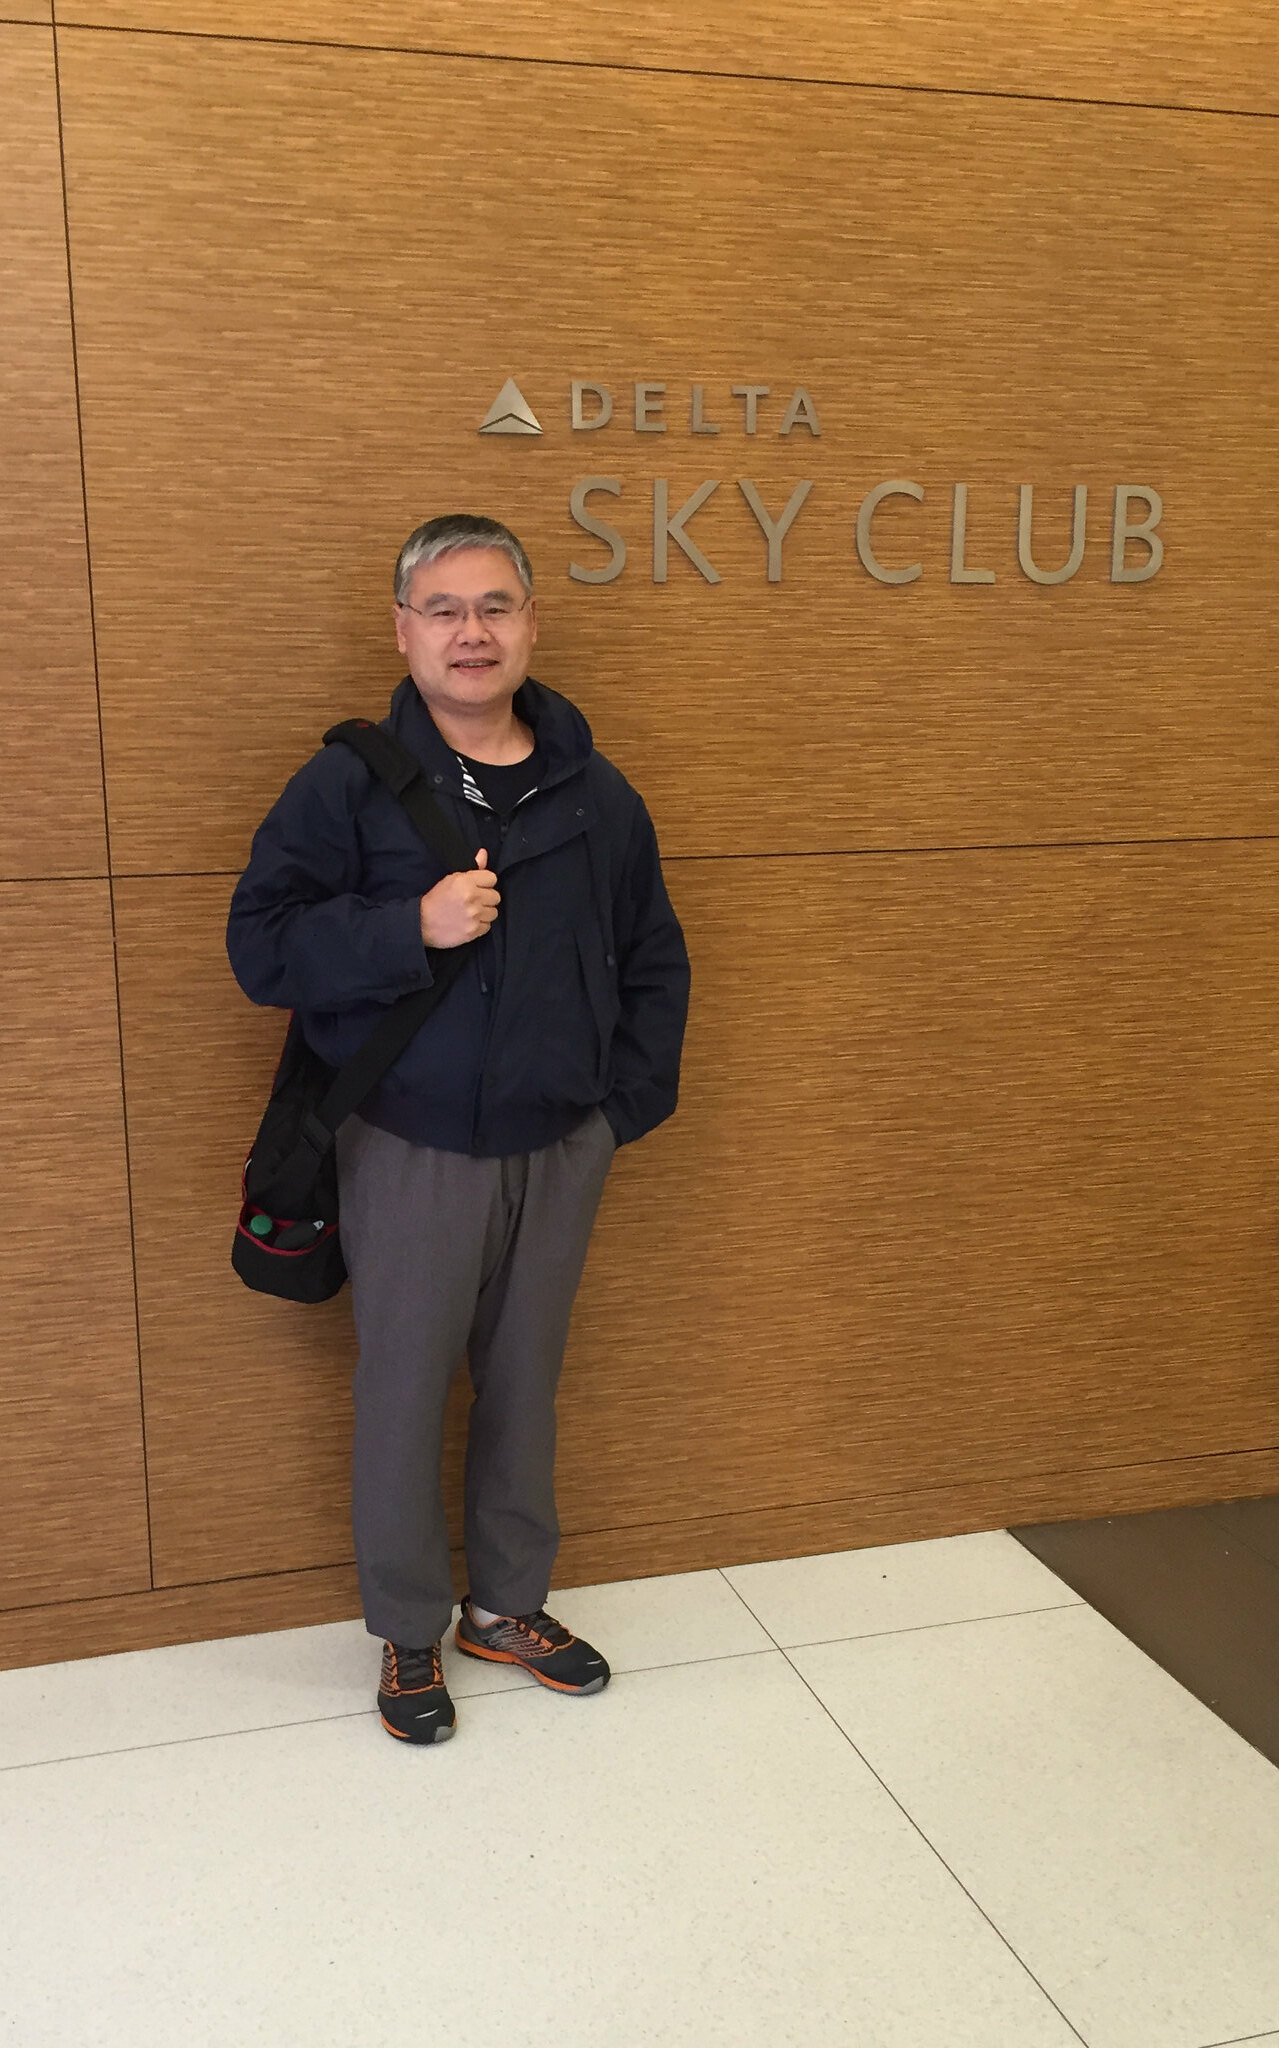 Sky Club entrance